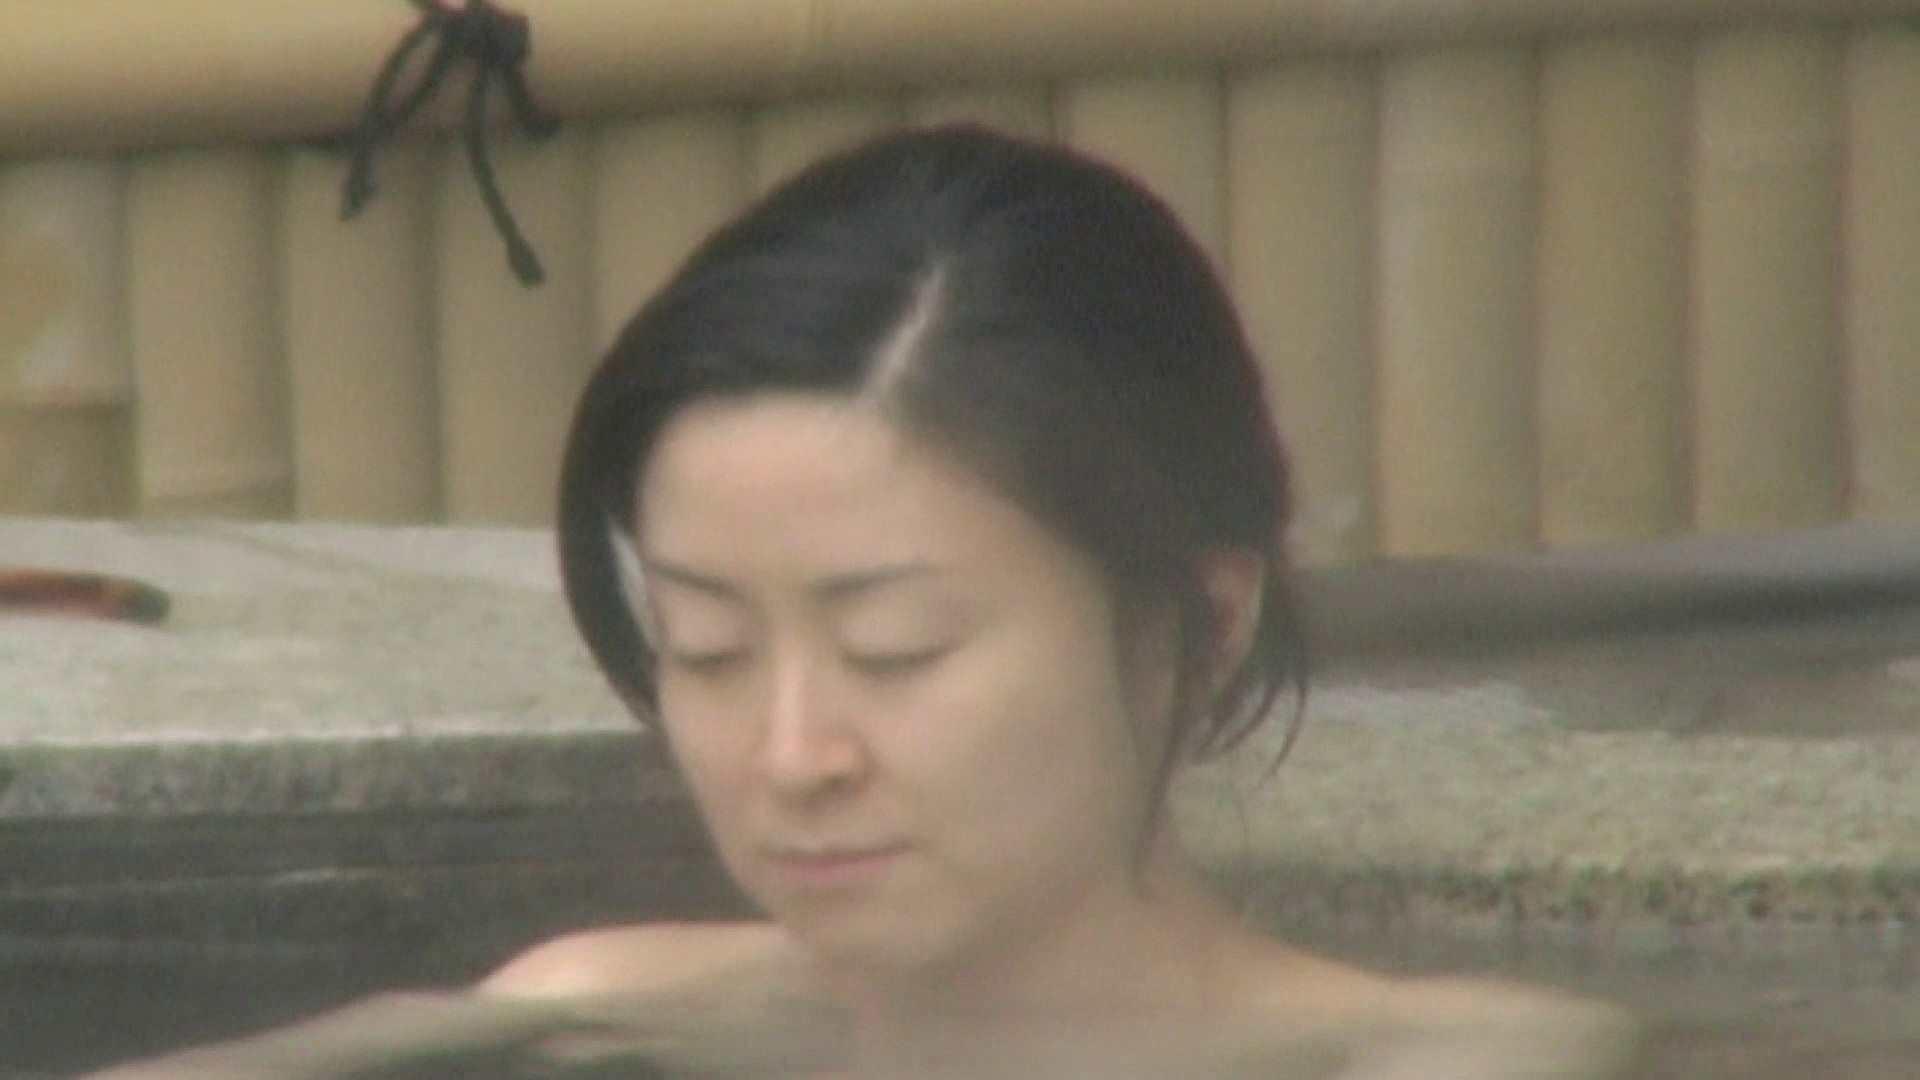 Aquaな露天風呂Vol.548 女体盗撮 | OL女体  70連発 25